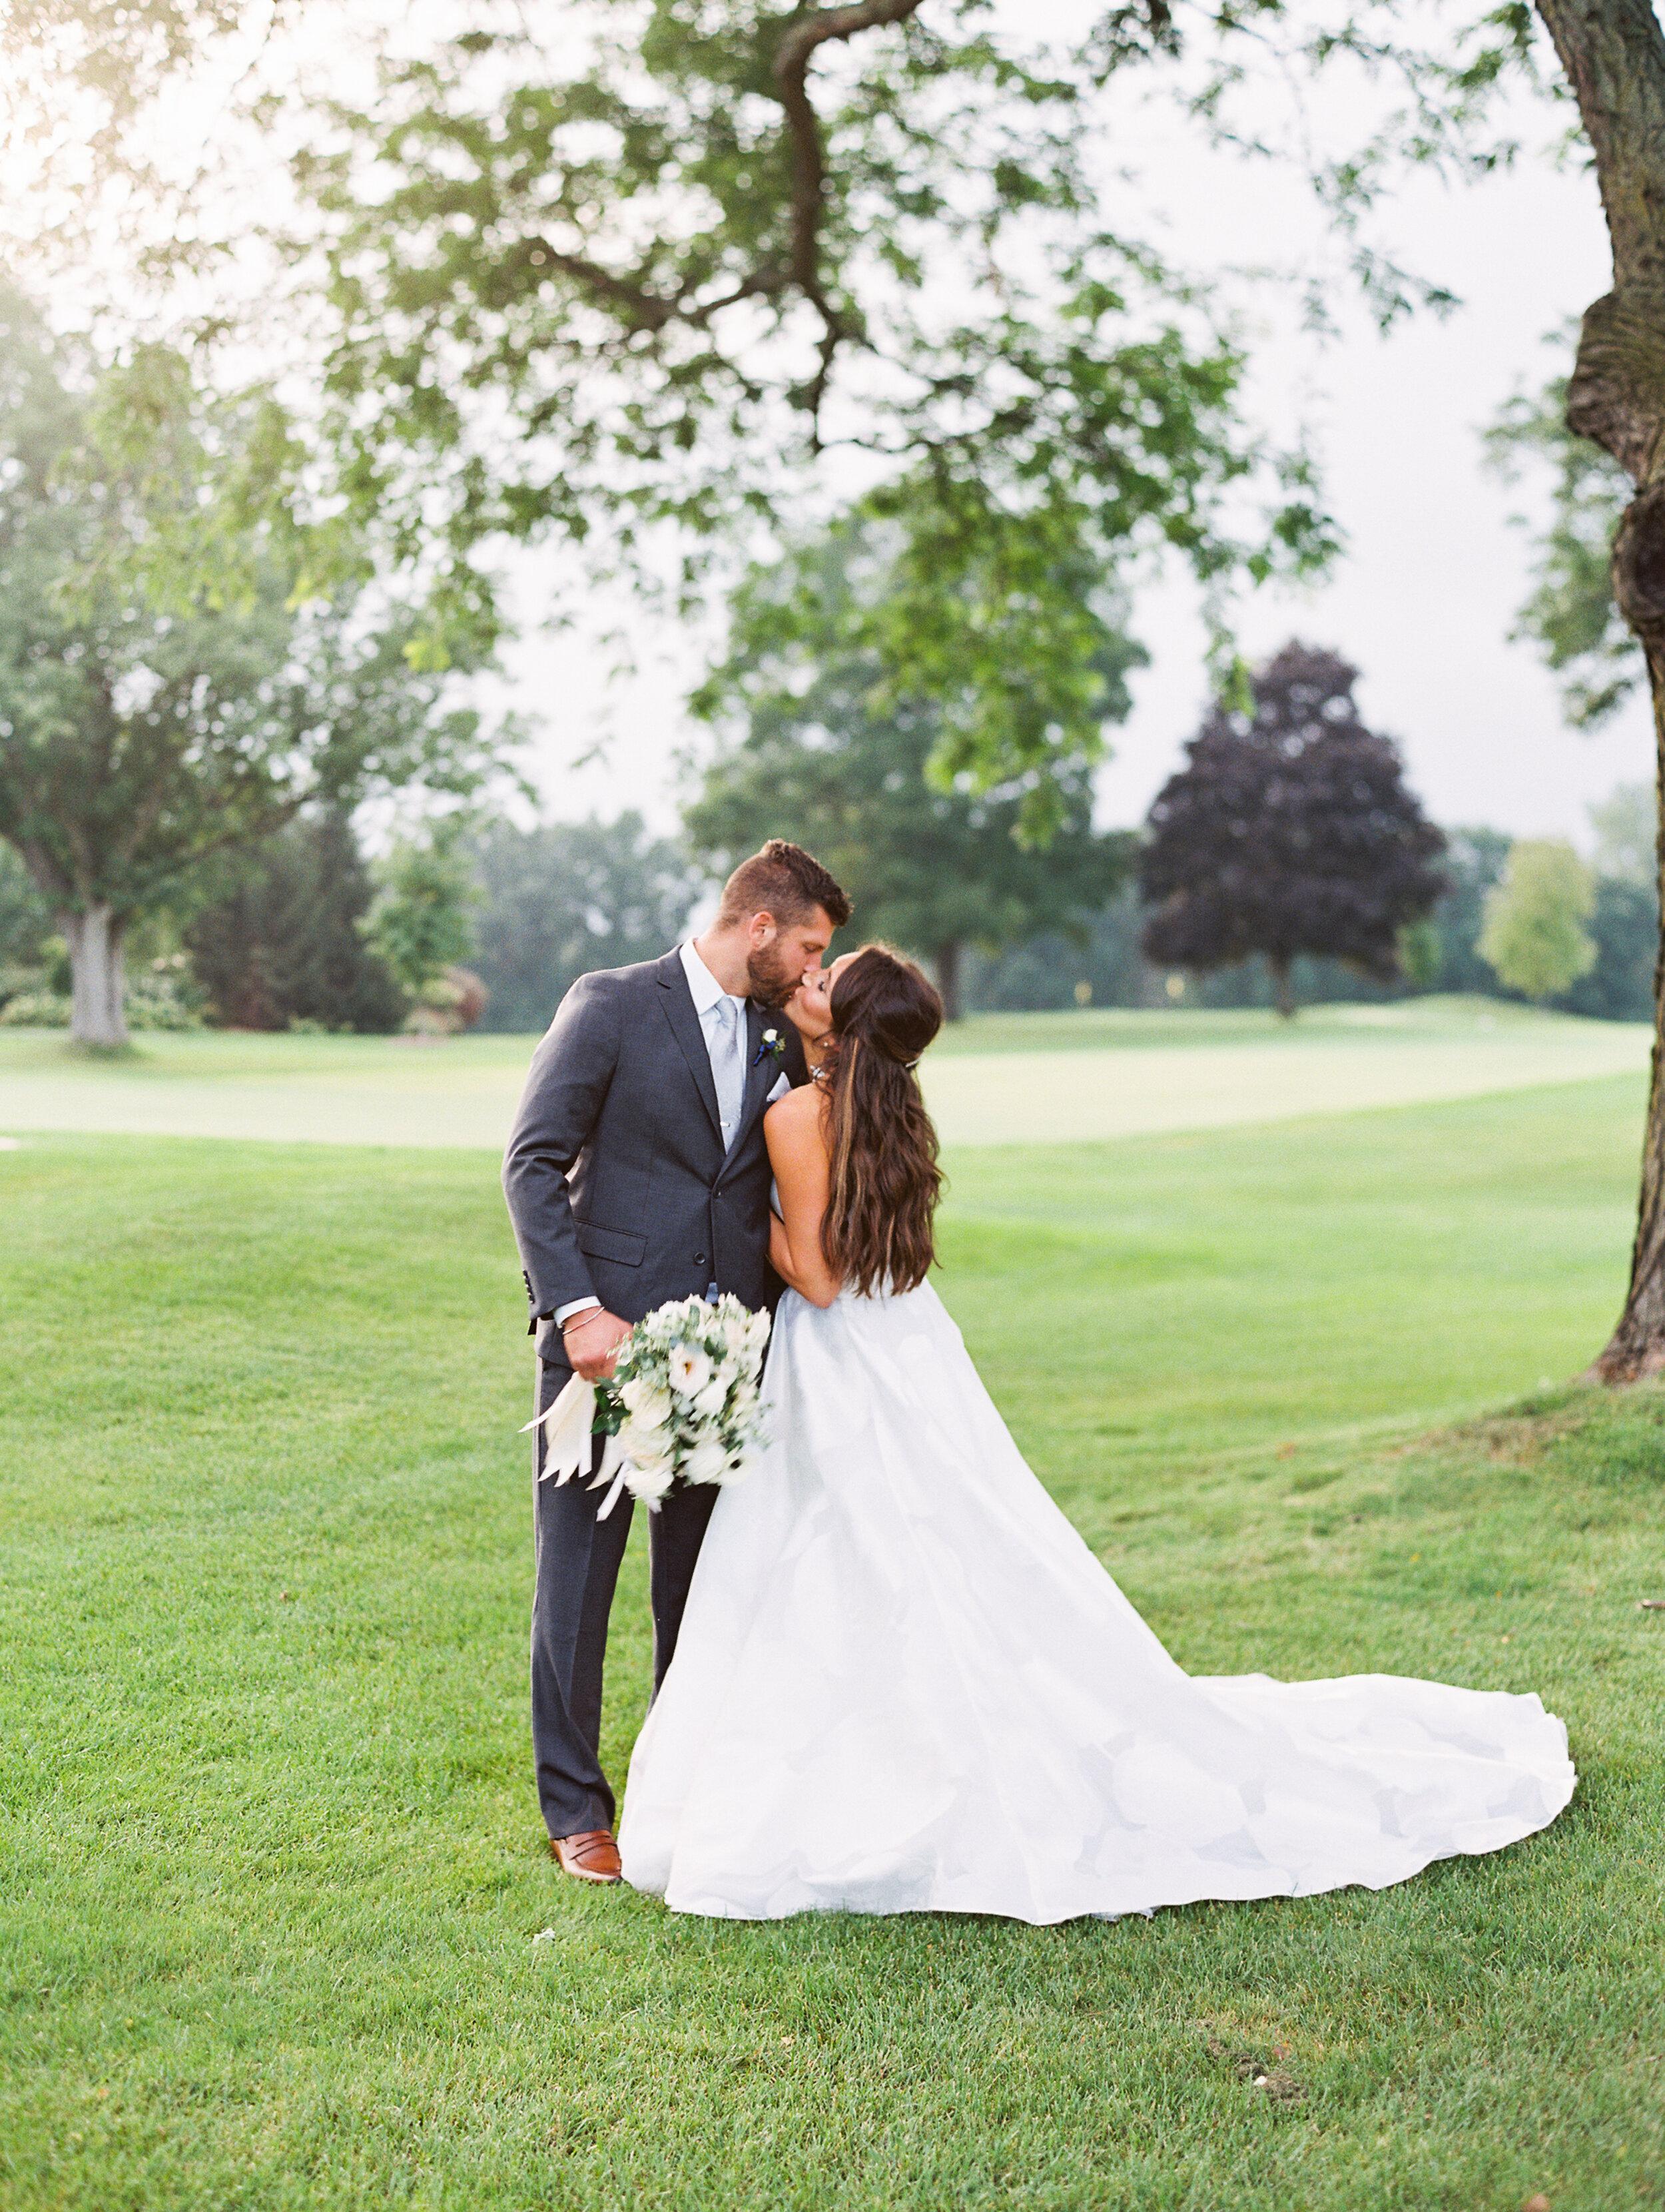 Kuiper+Wedding+Reception+Bridal+Party-153.jpg